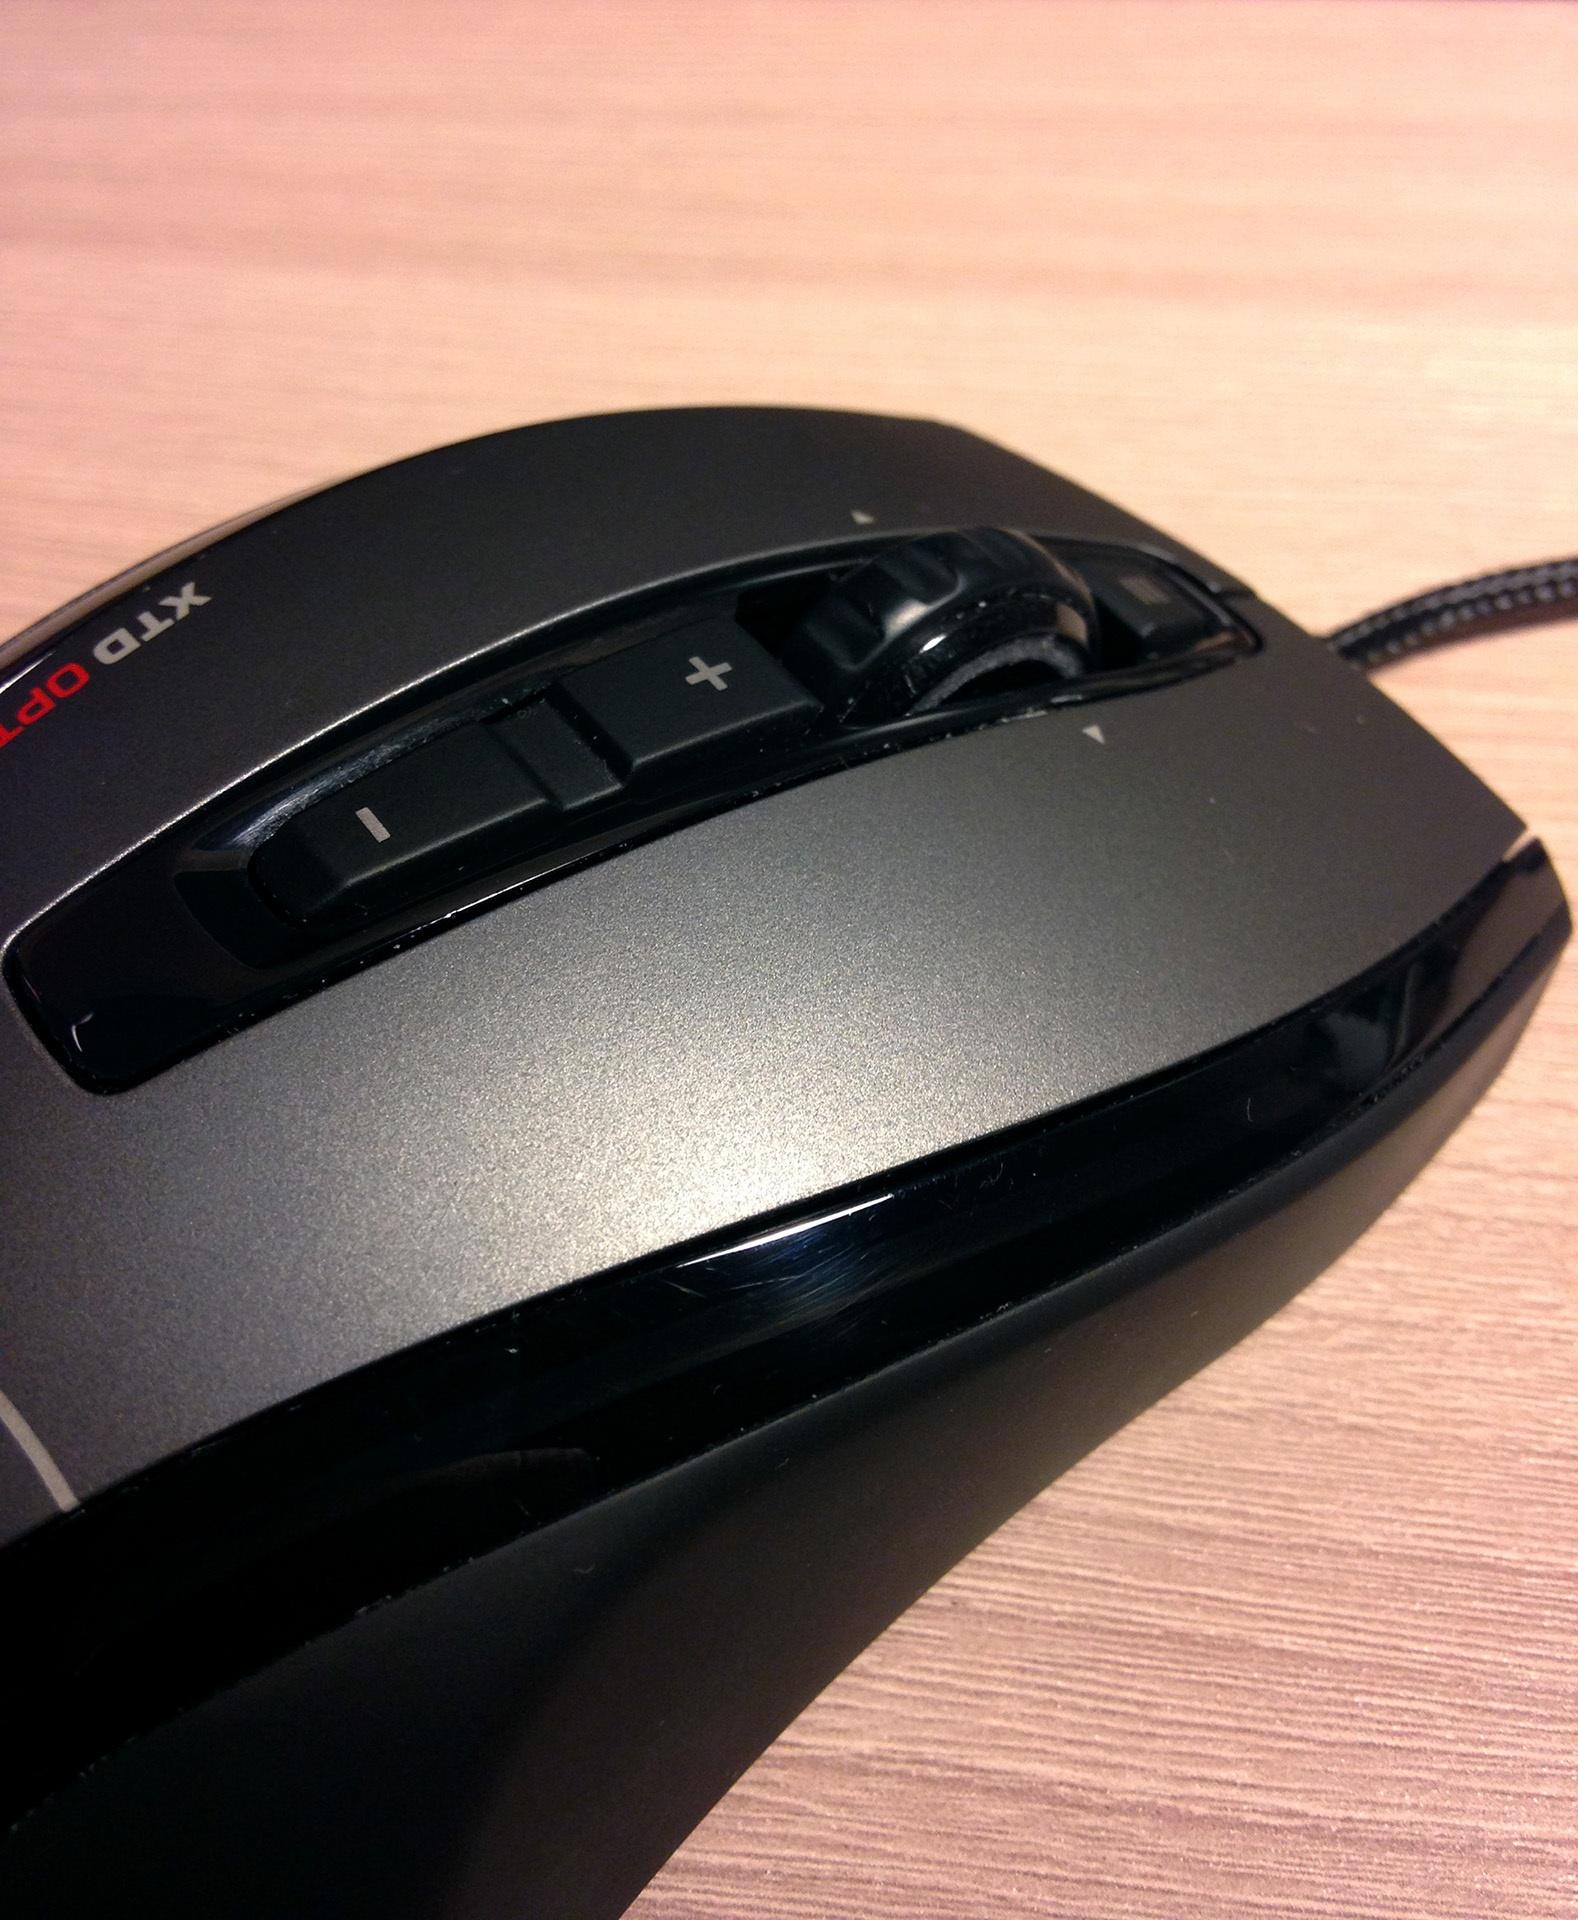 Мышки топ-сегмента – Roccat Kone XTD и Roccat Kone XTD Optical - 13